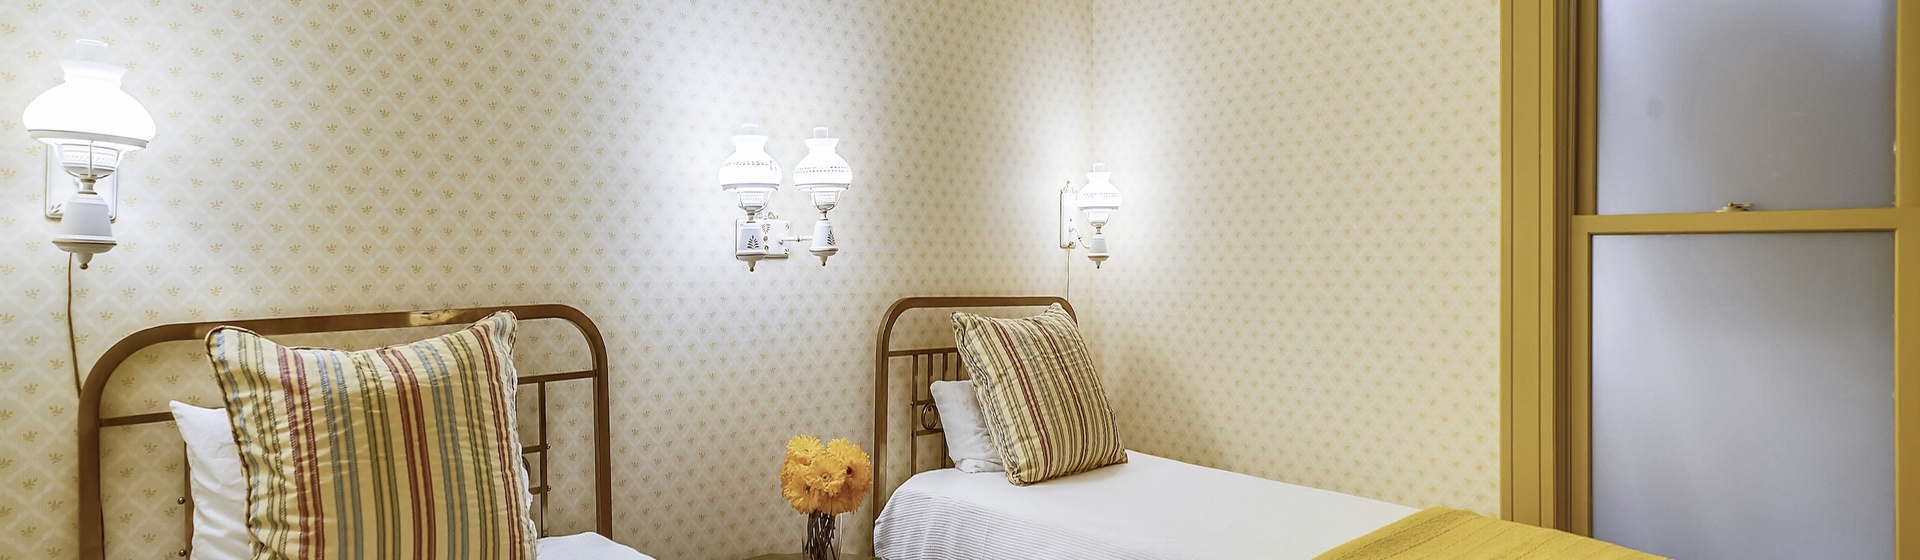 3.06-telluride-summer-haus-bedroom-B-web.jpg